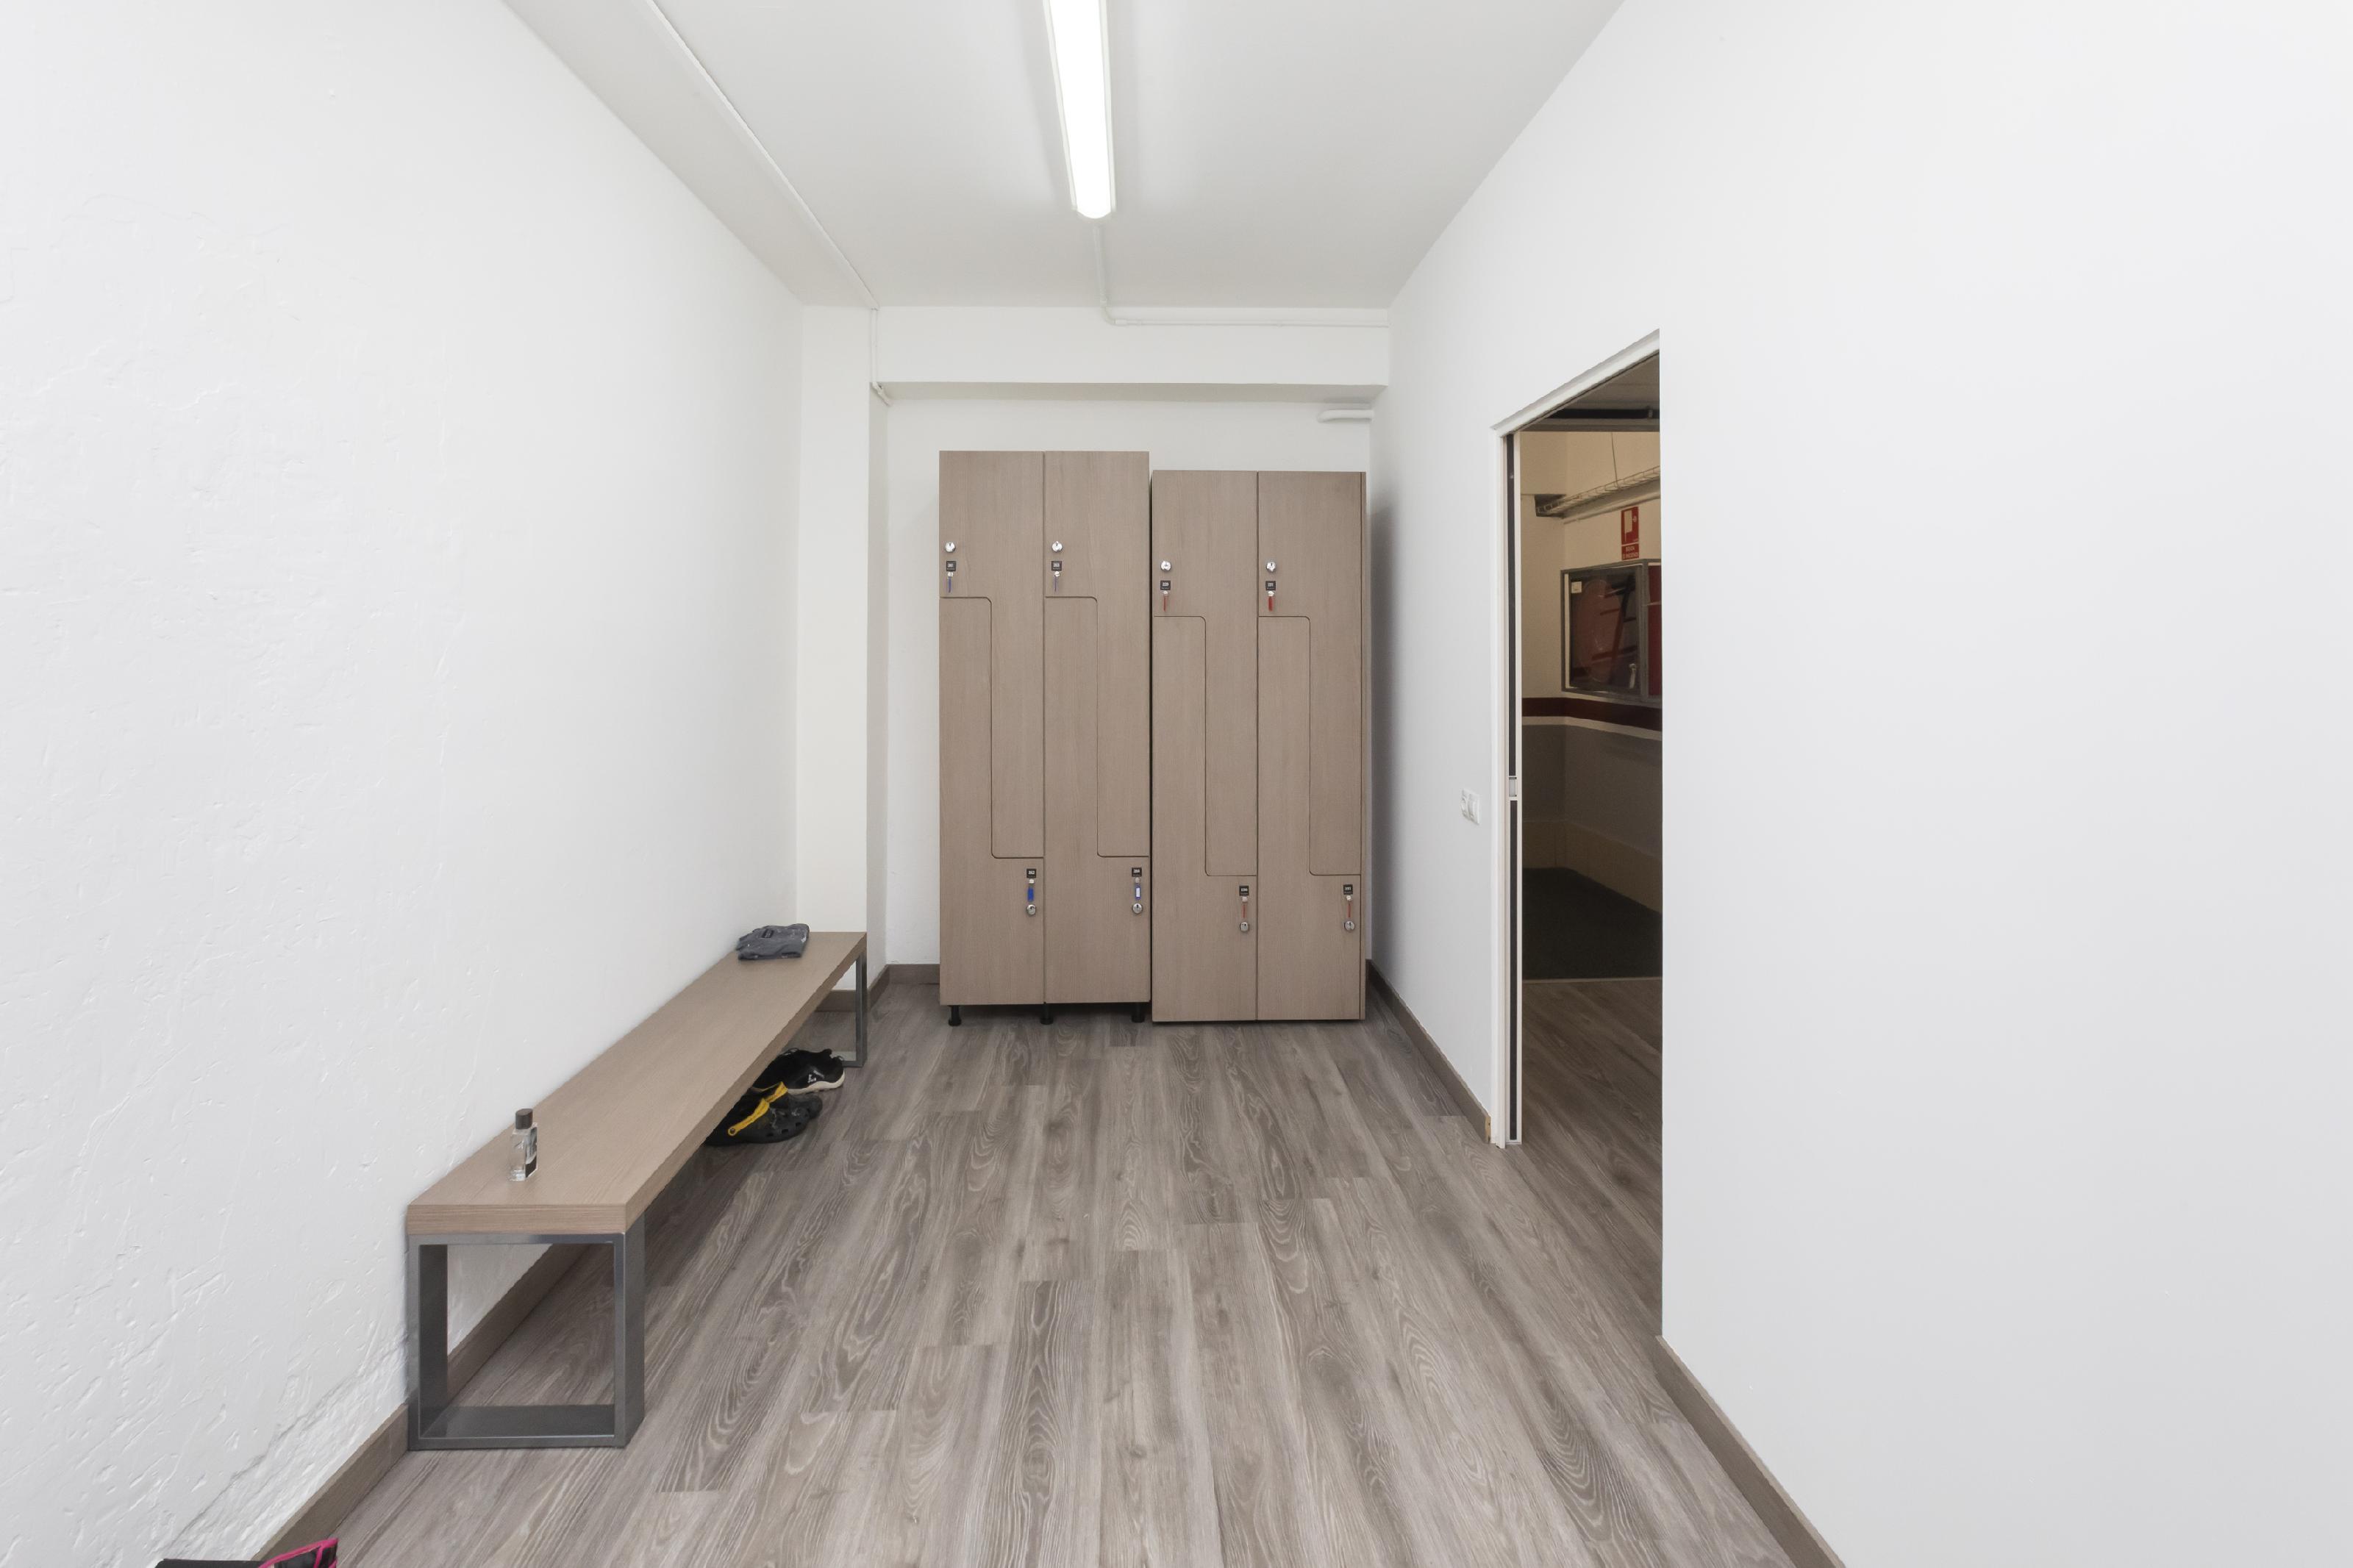 249493 Commercial premises for sale in Sarrià-Sant Gervasi, Sant Gervasi-Galvany 13